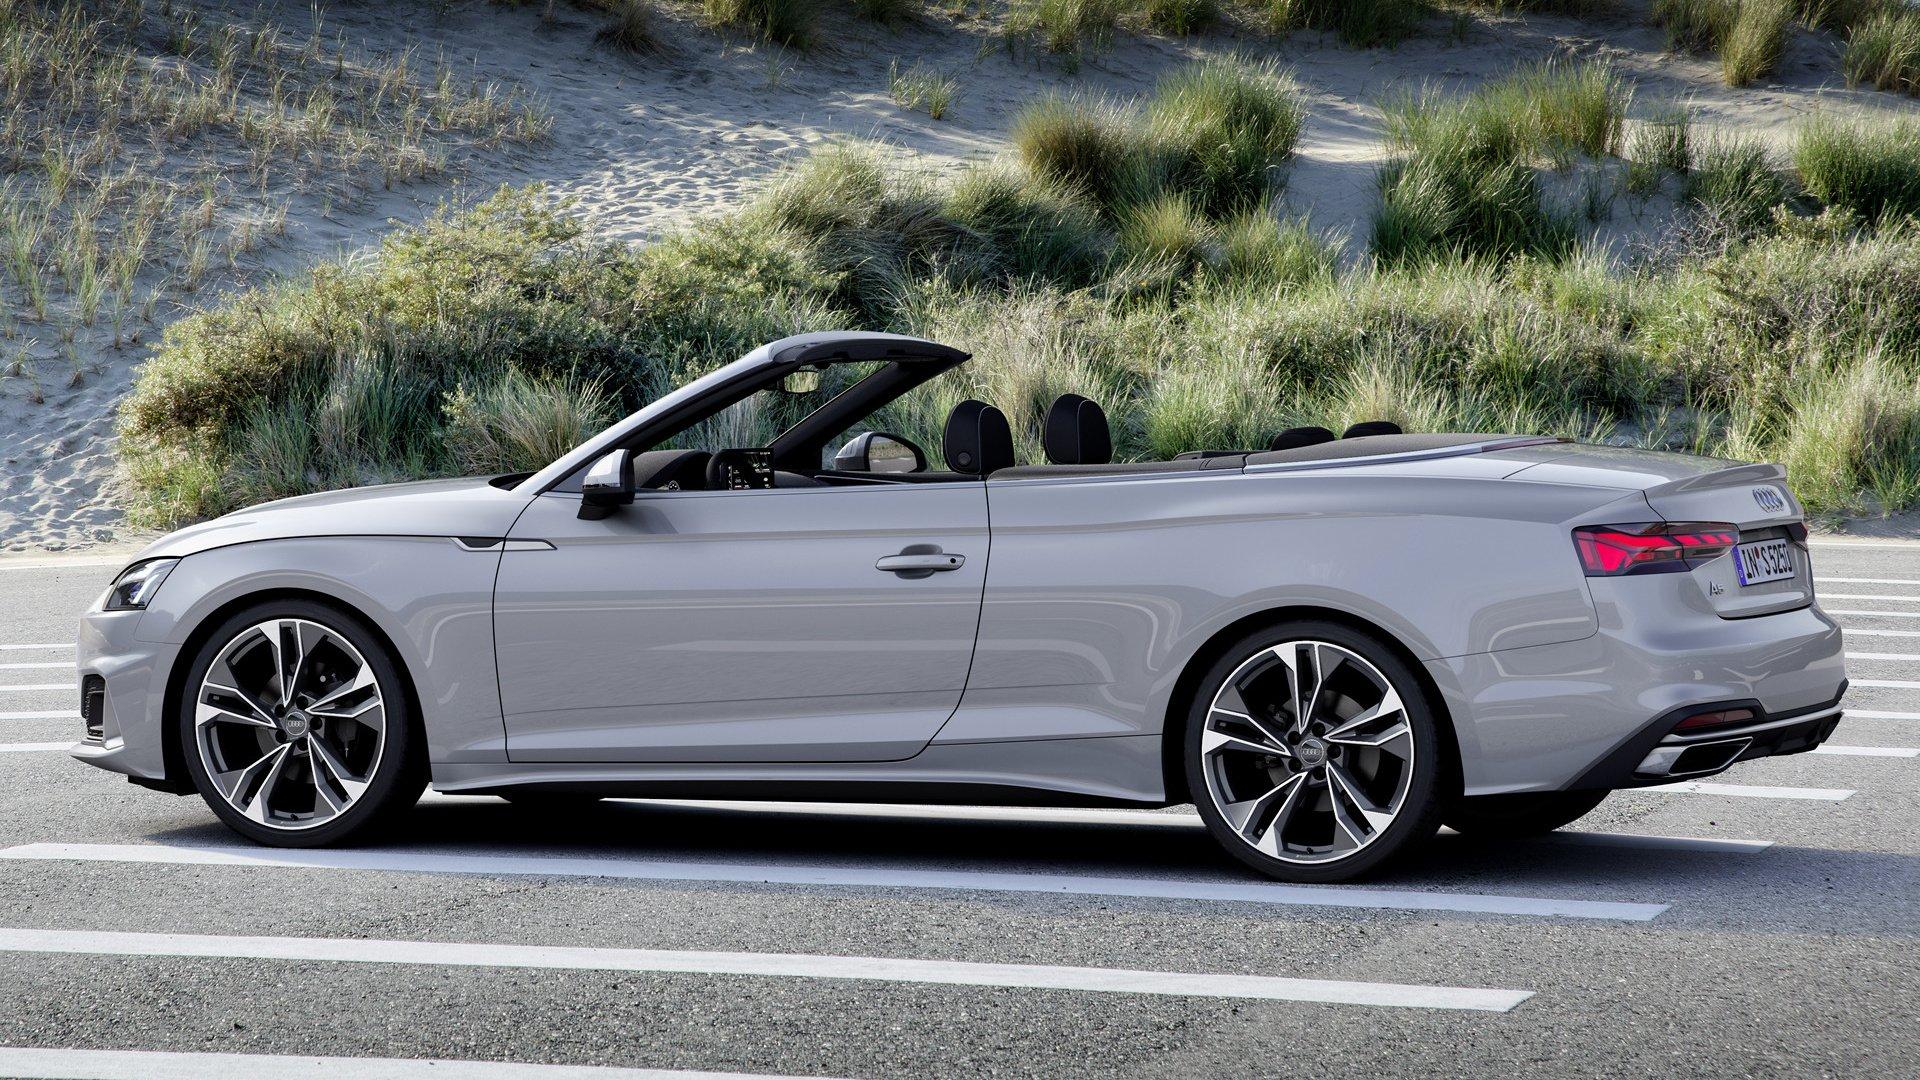 2020 Audi A5 Cabriolet Papel De Parede Hd Plano De Fundo 1920x1080 Id 1040829 Wallpaper Abyss